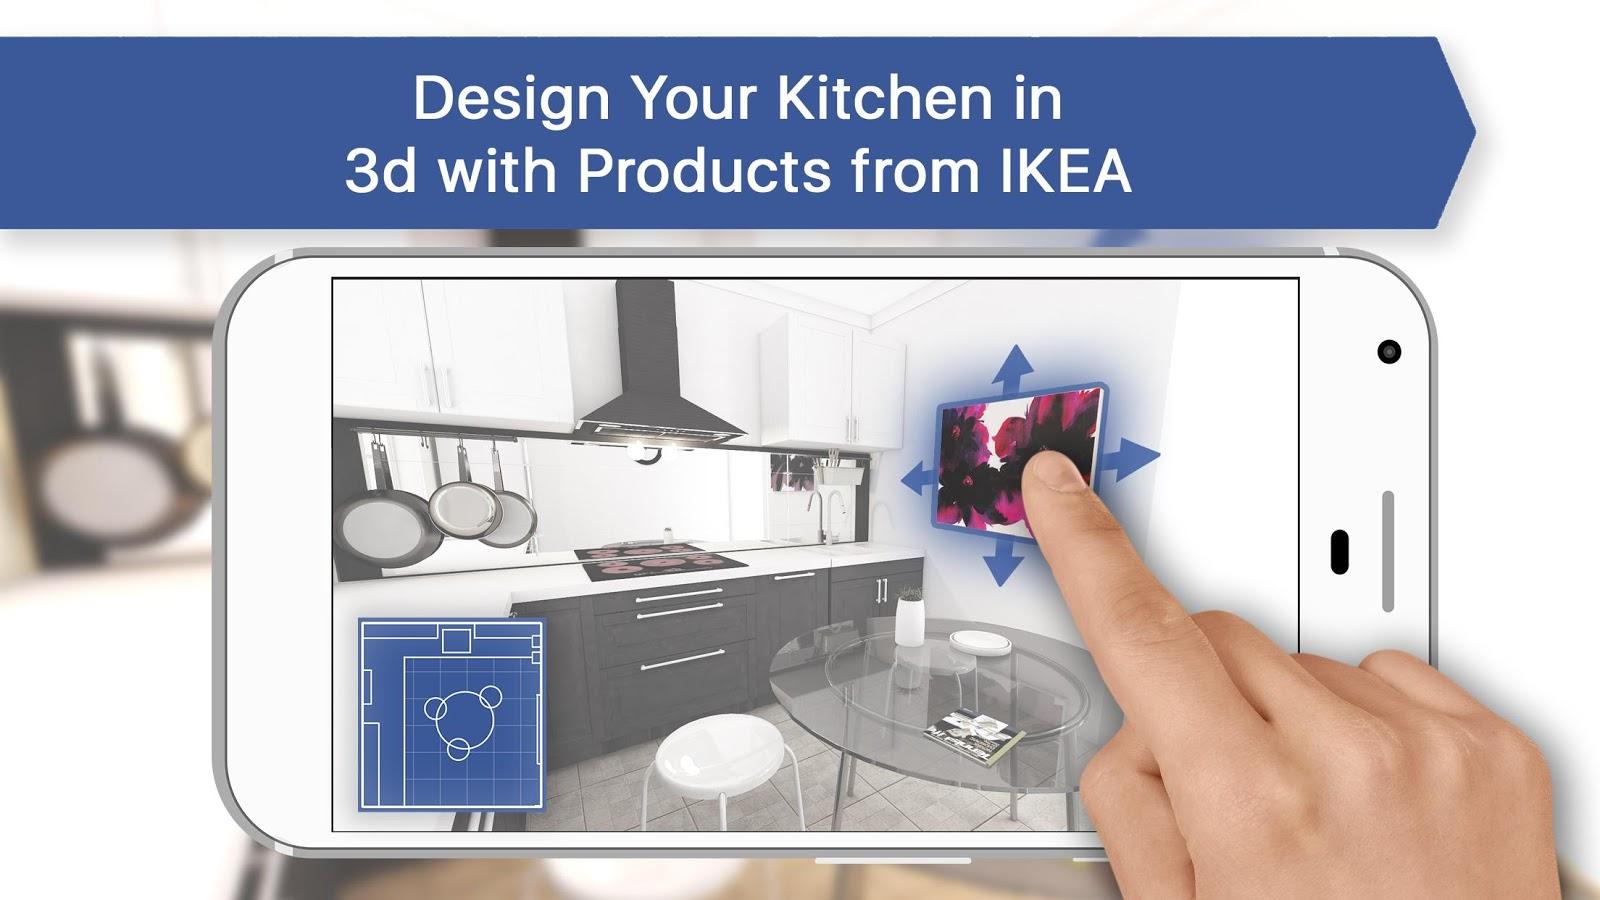 3d kitchen design for ikea room interior planner android apps 3d kitchen design for ikea room interior planner screenshot